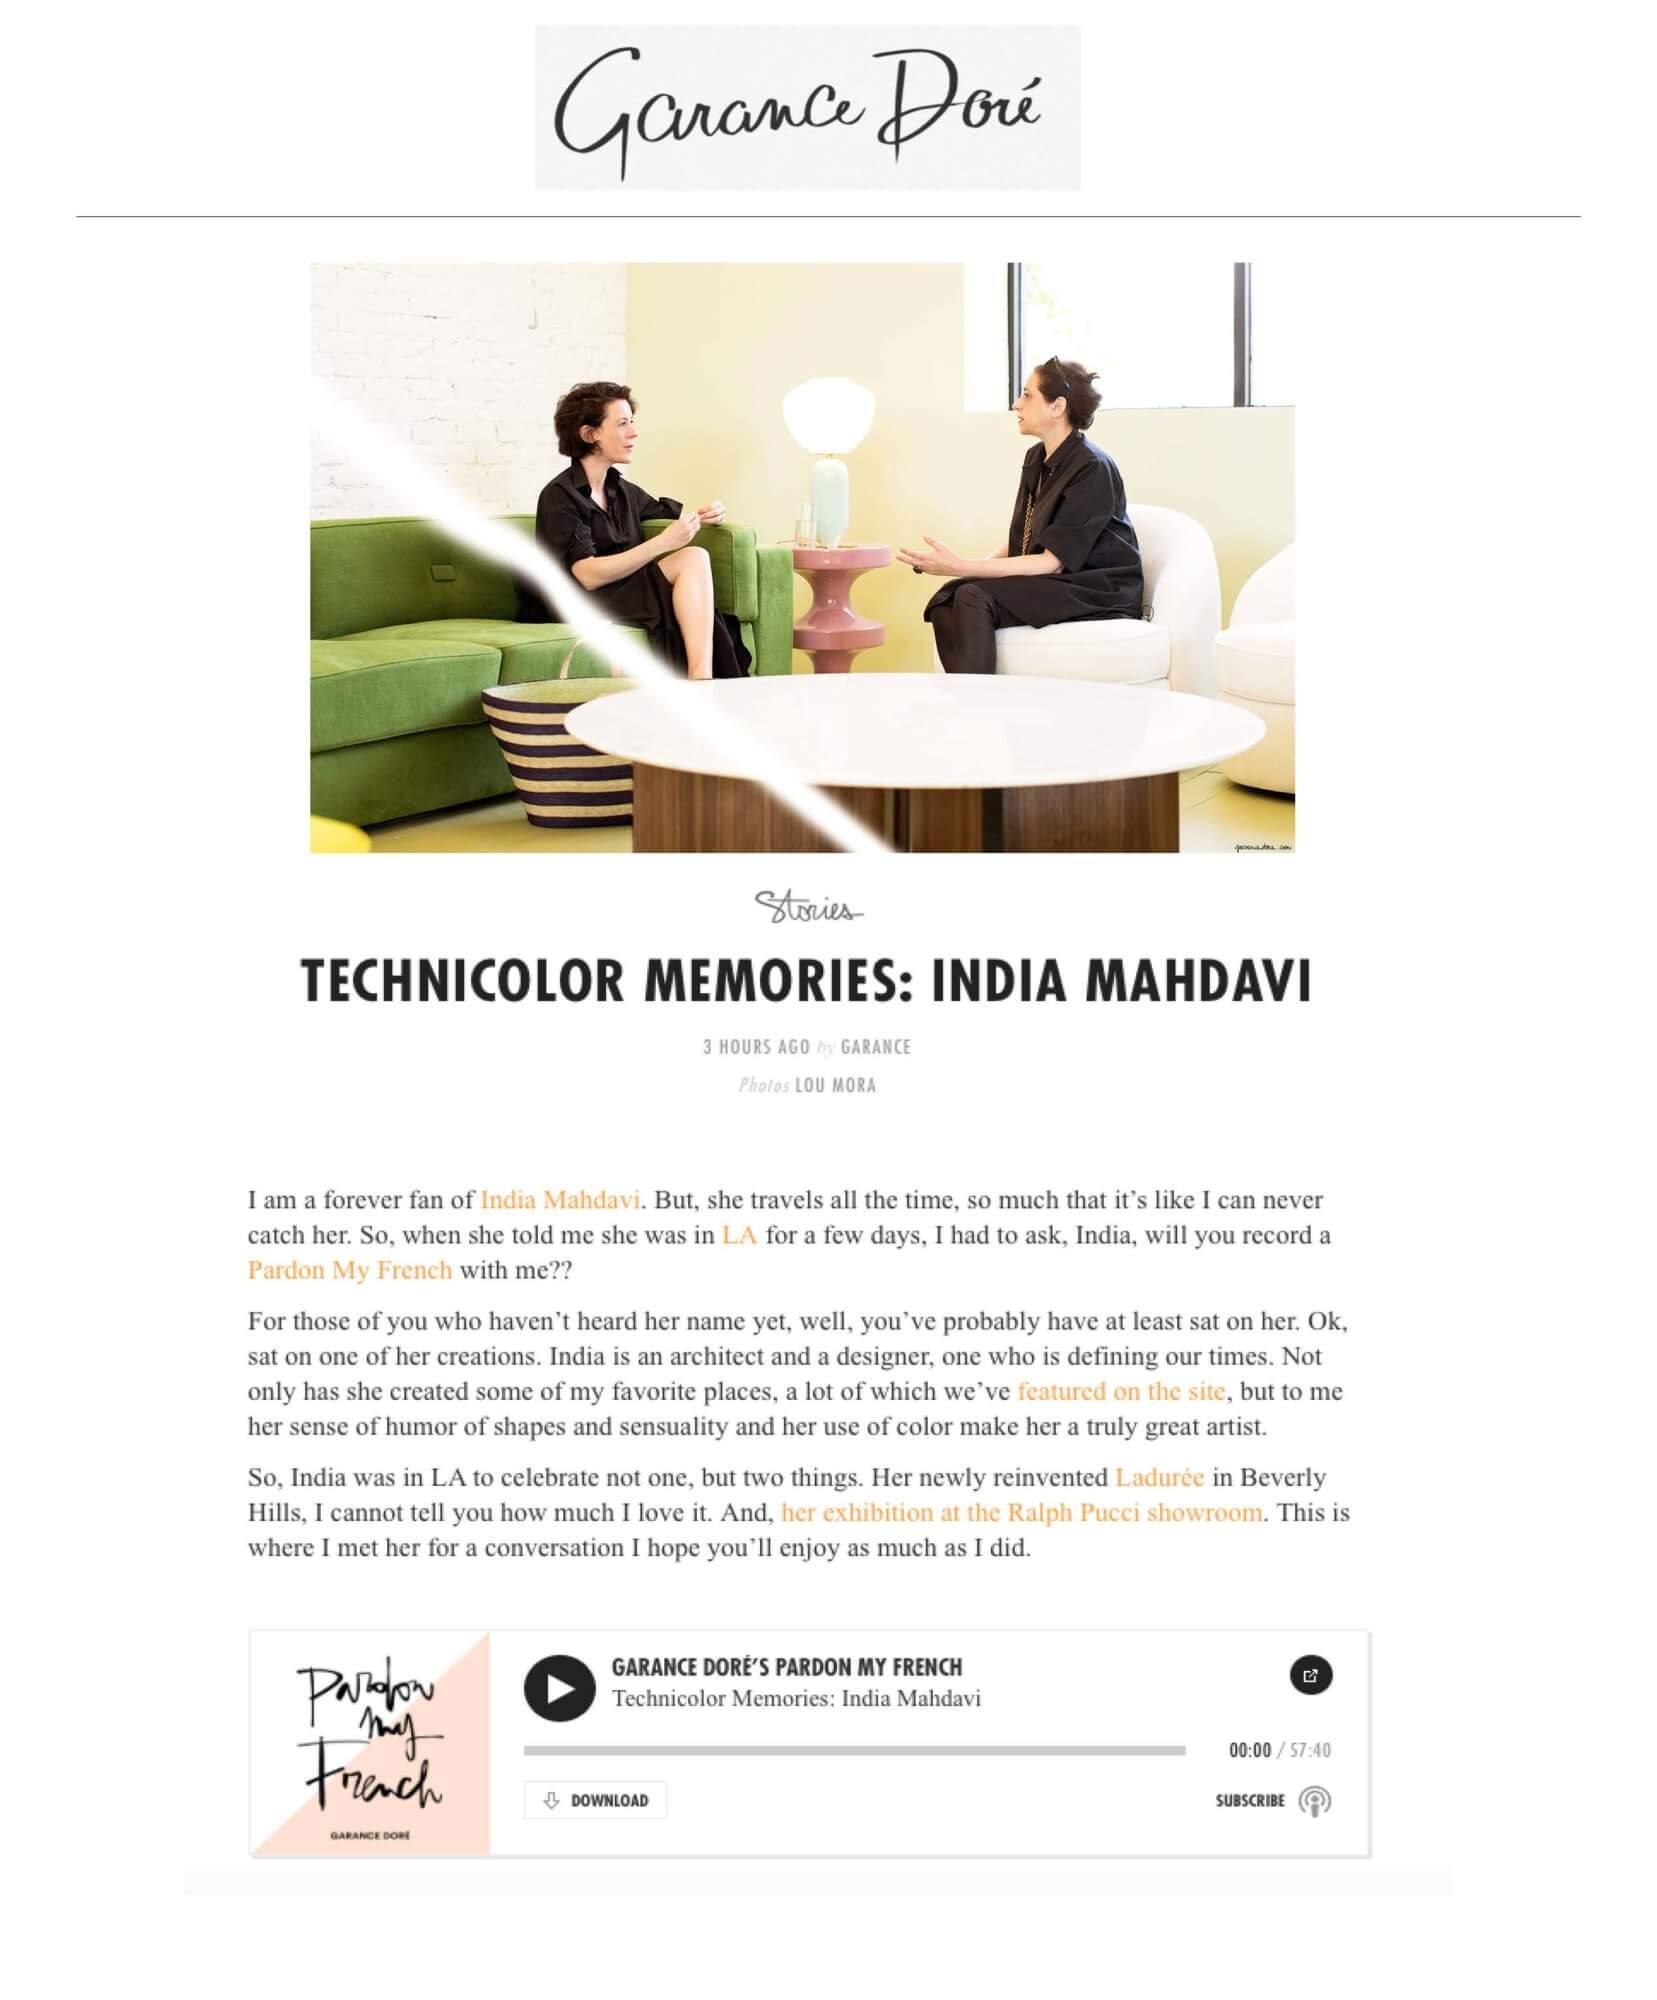 Technicolors memories: India Mahdavi - India Mahdavi